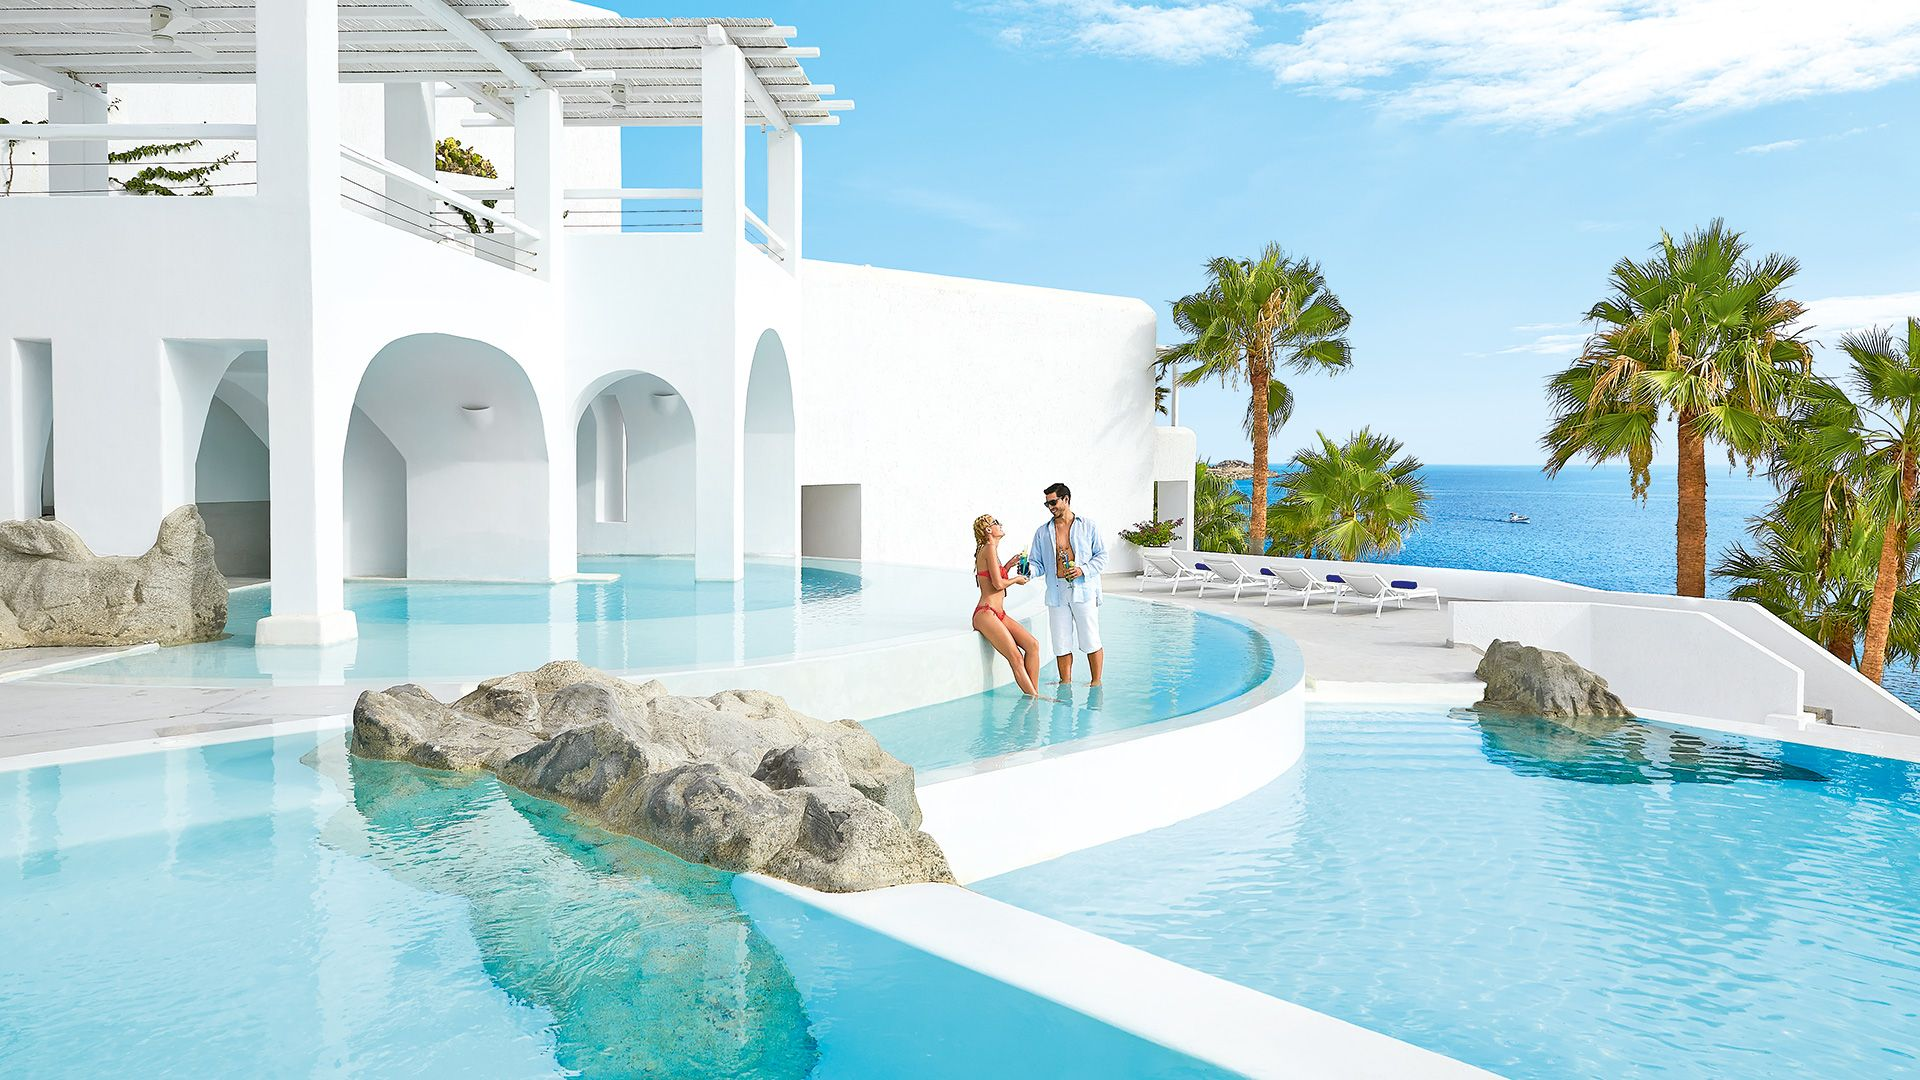 Luxury Villas In Mykonos And Suites Island Blu Is A Unique Five Star Hotel Resort Greece